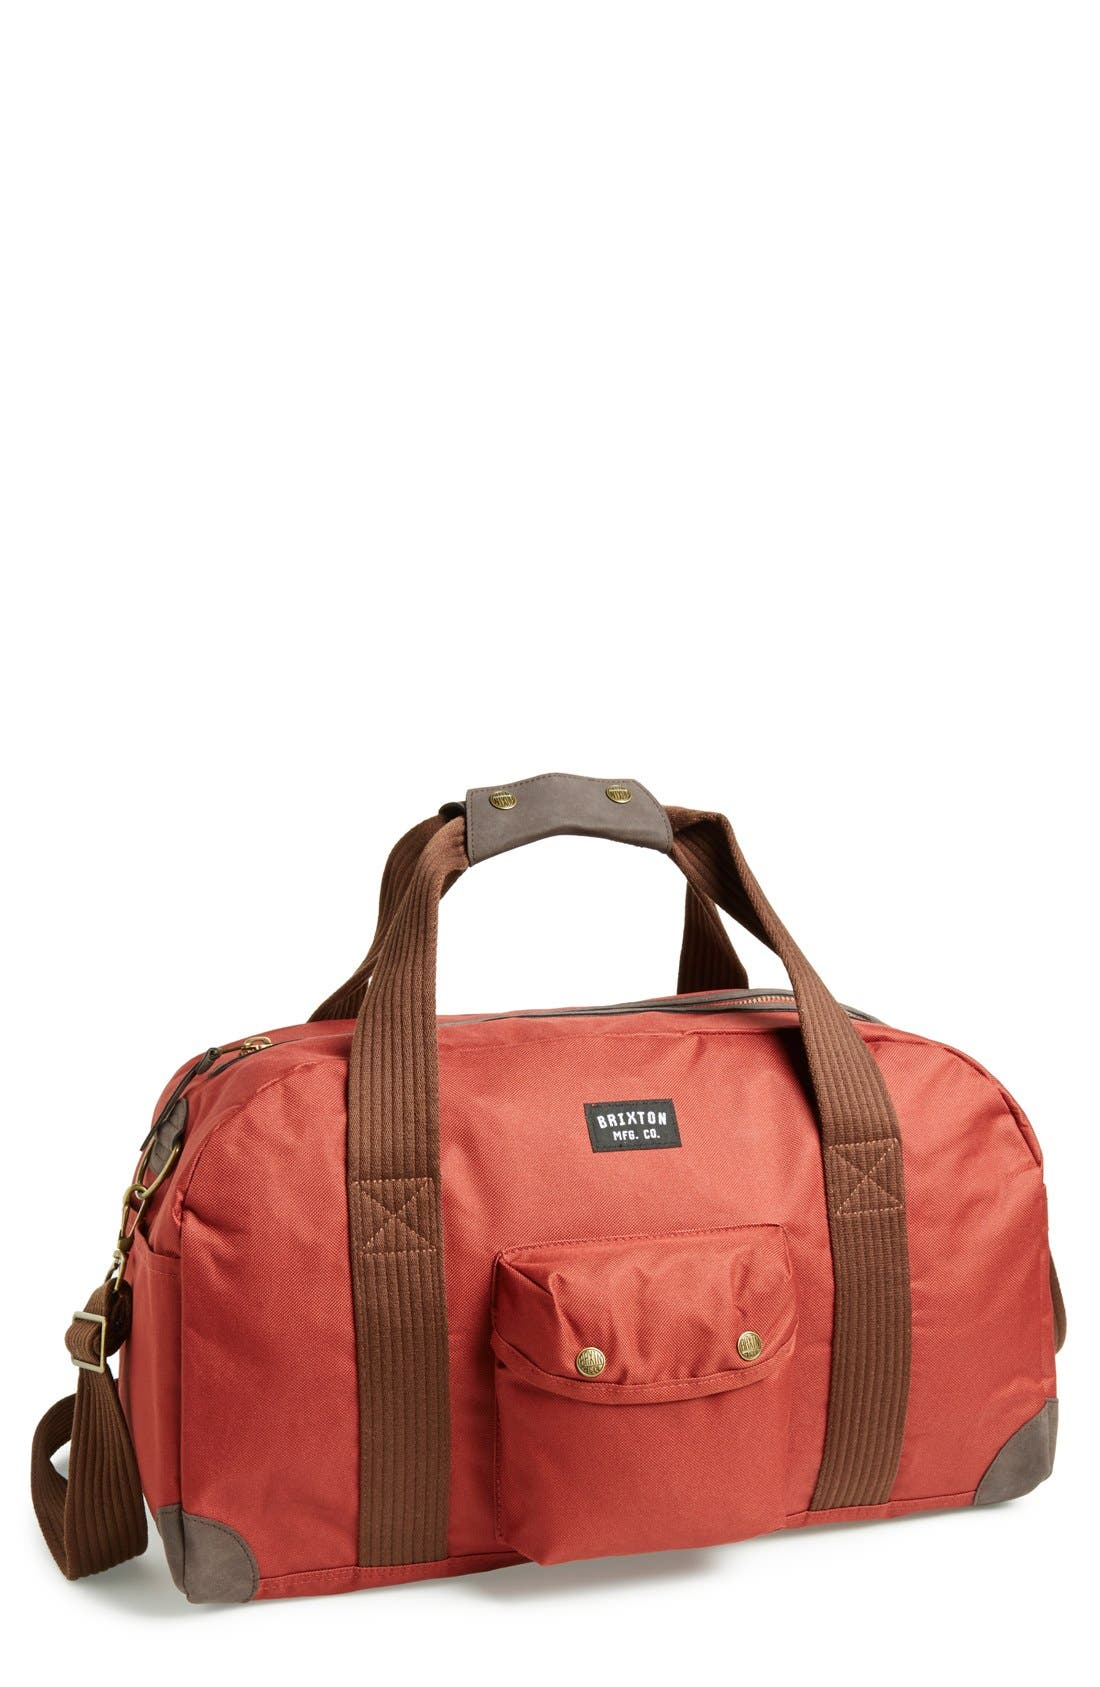 Main Image - Brixton 'Vagrant' Duffel Bag